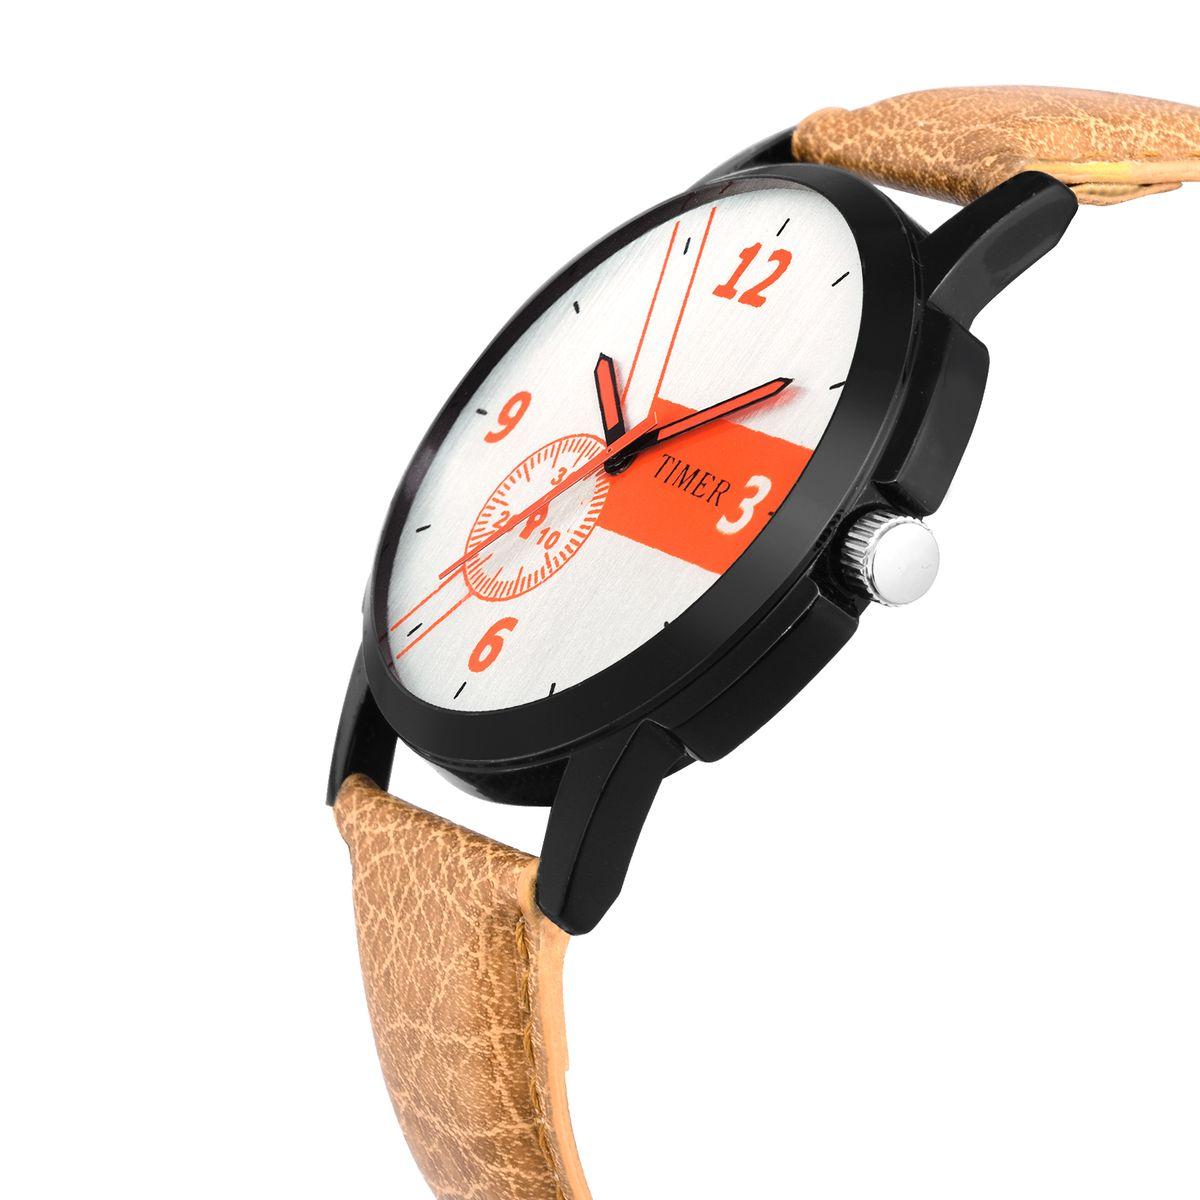 Timer stylish sporty analog watch for boys TC-640